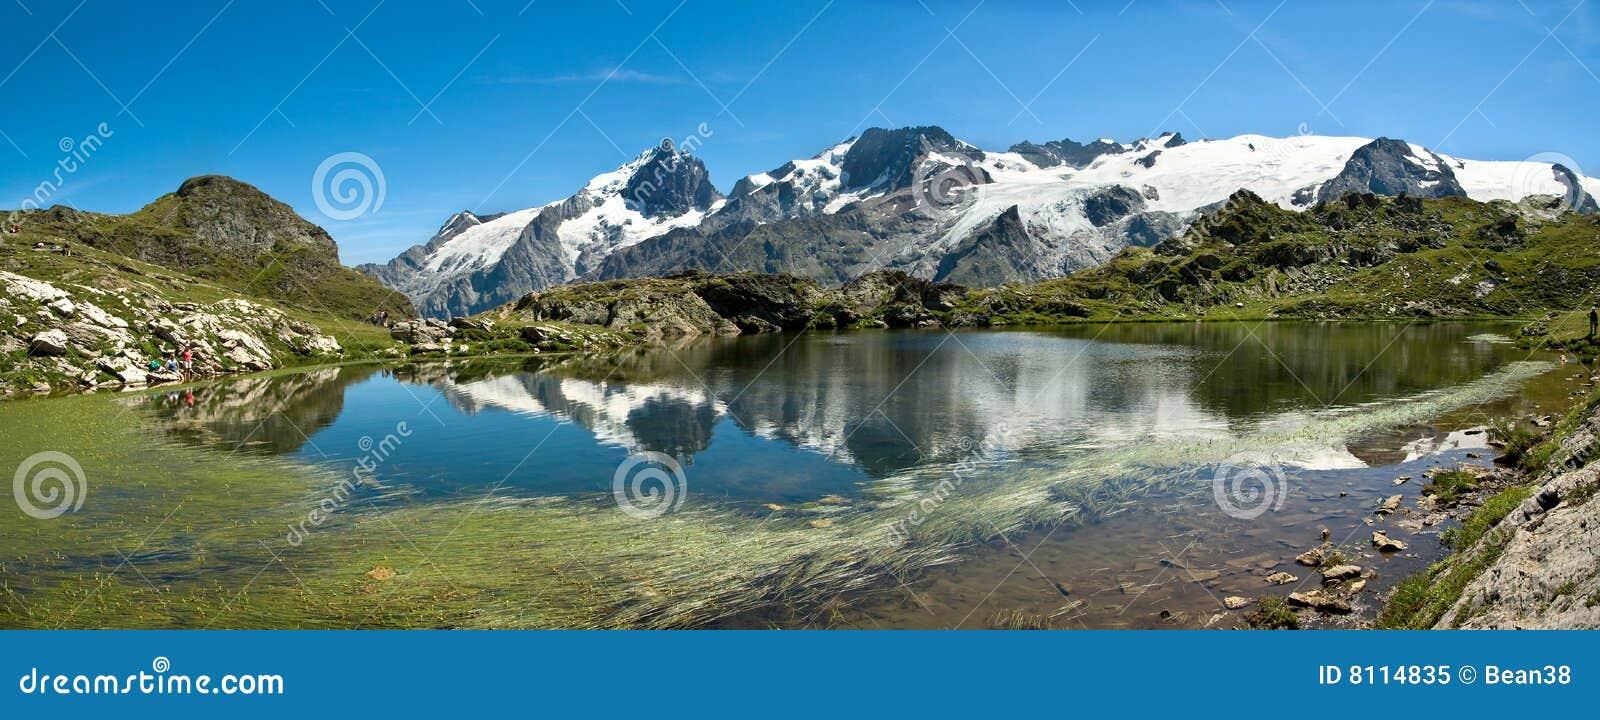 La Meije - French alpes